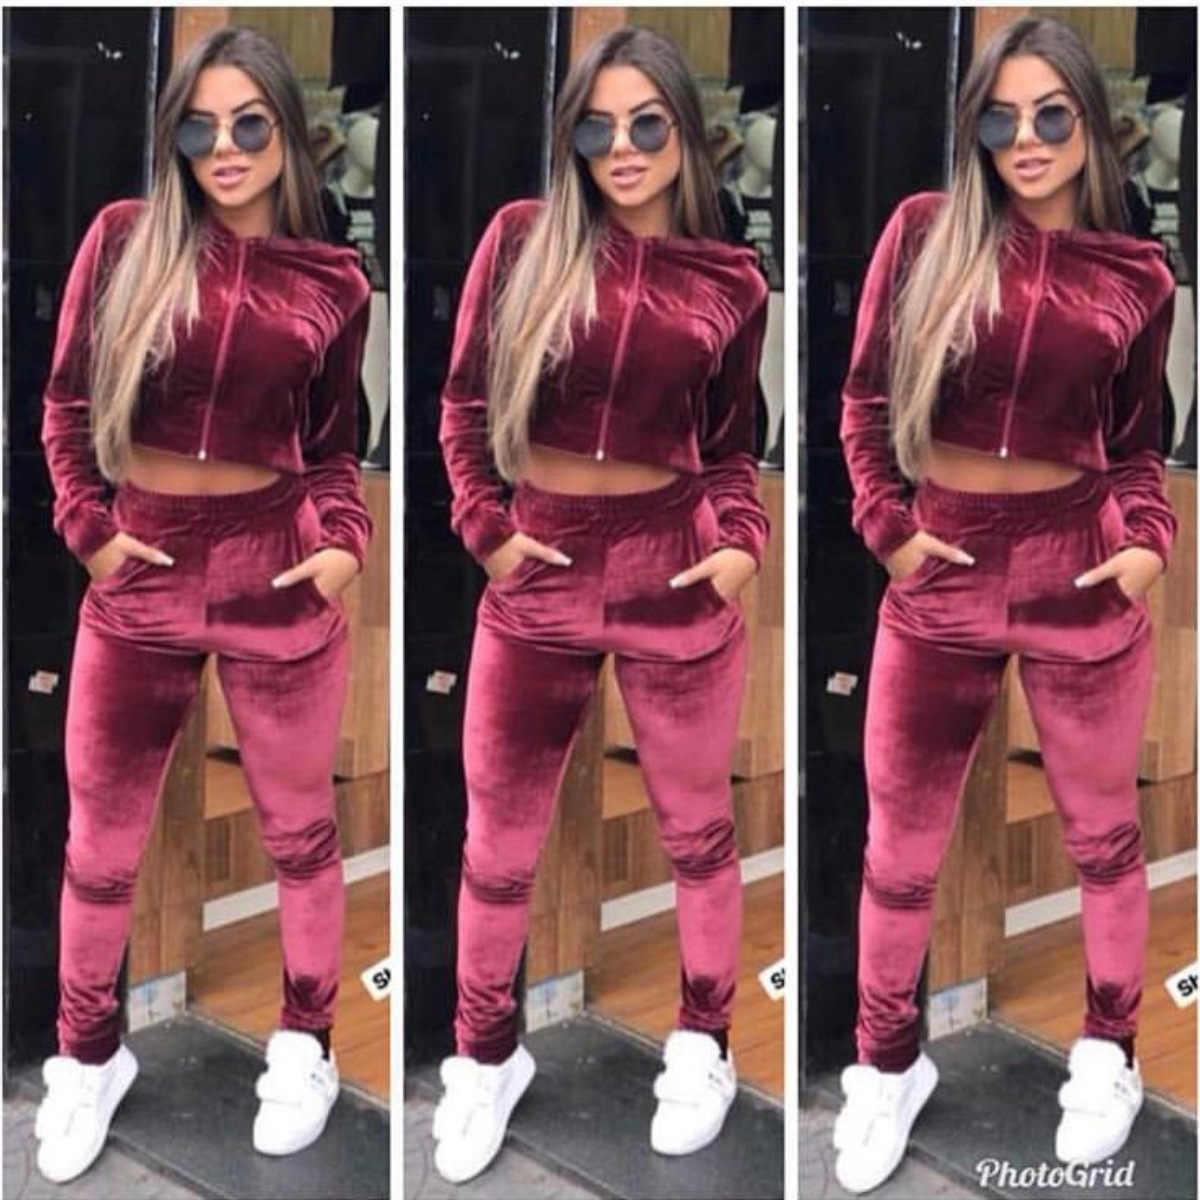 Autumn 2019 Outfits Velvet Two Piece Set Women Sweatsuit Short Design Hoodie Tops Pant Sweat Suit Matching Velour Tracksuit Aliexpress